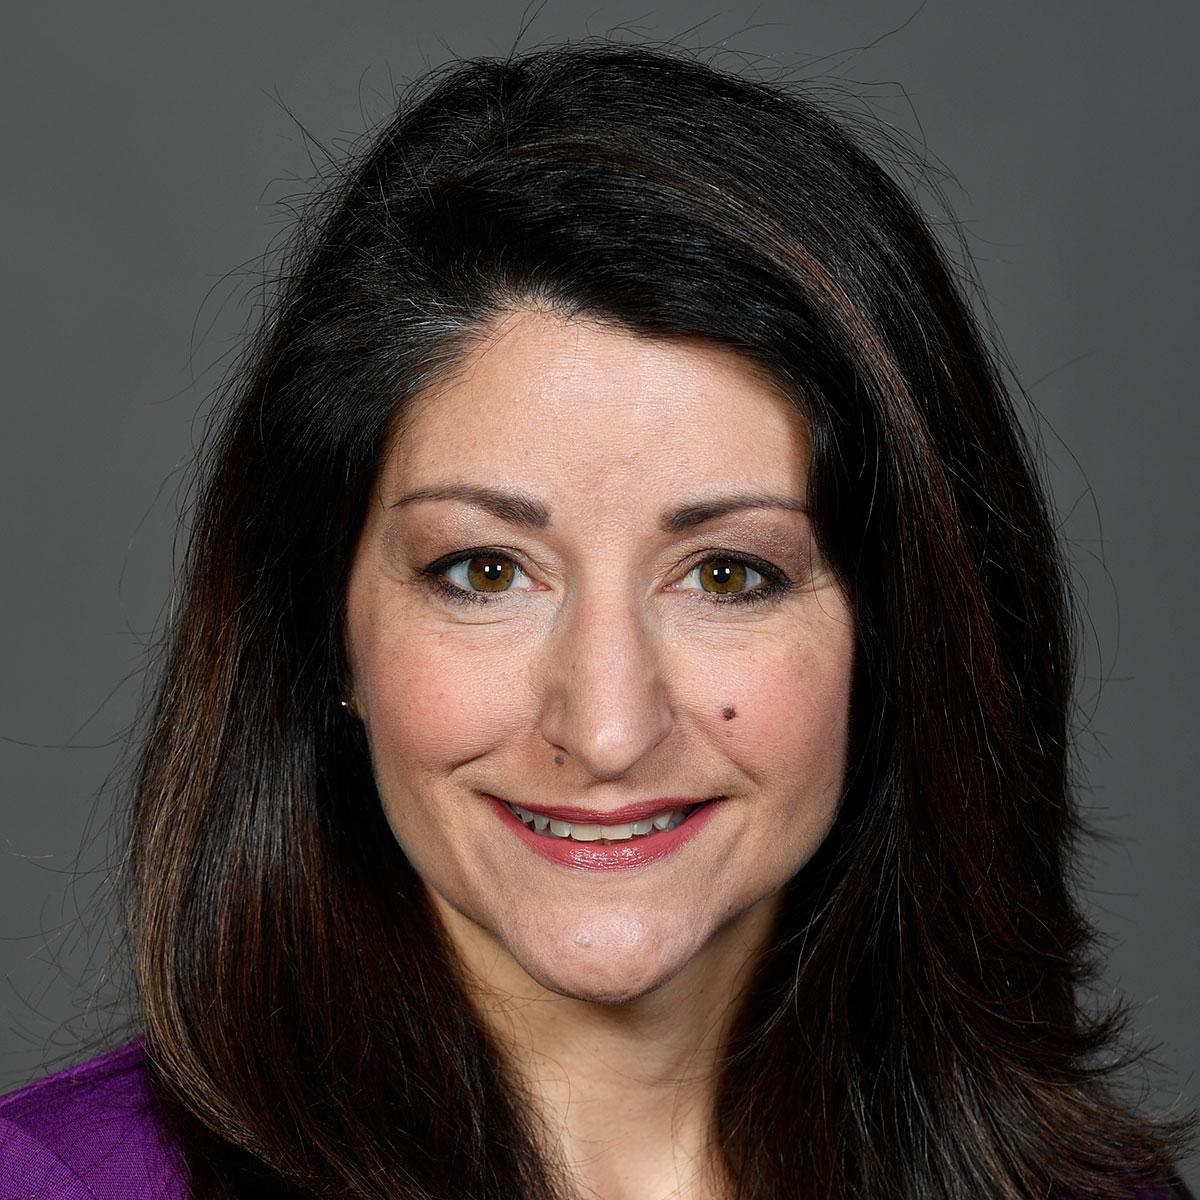 April Stolzenbach